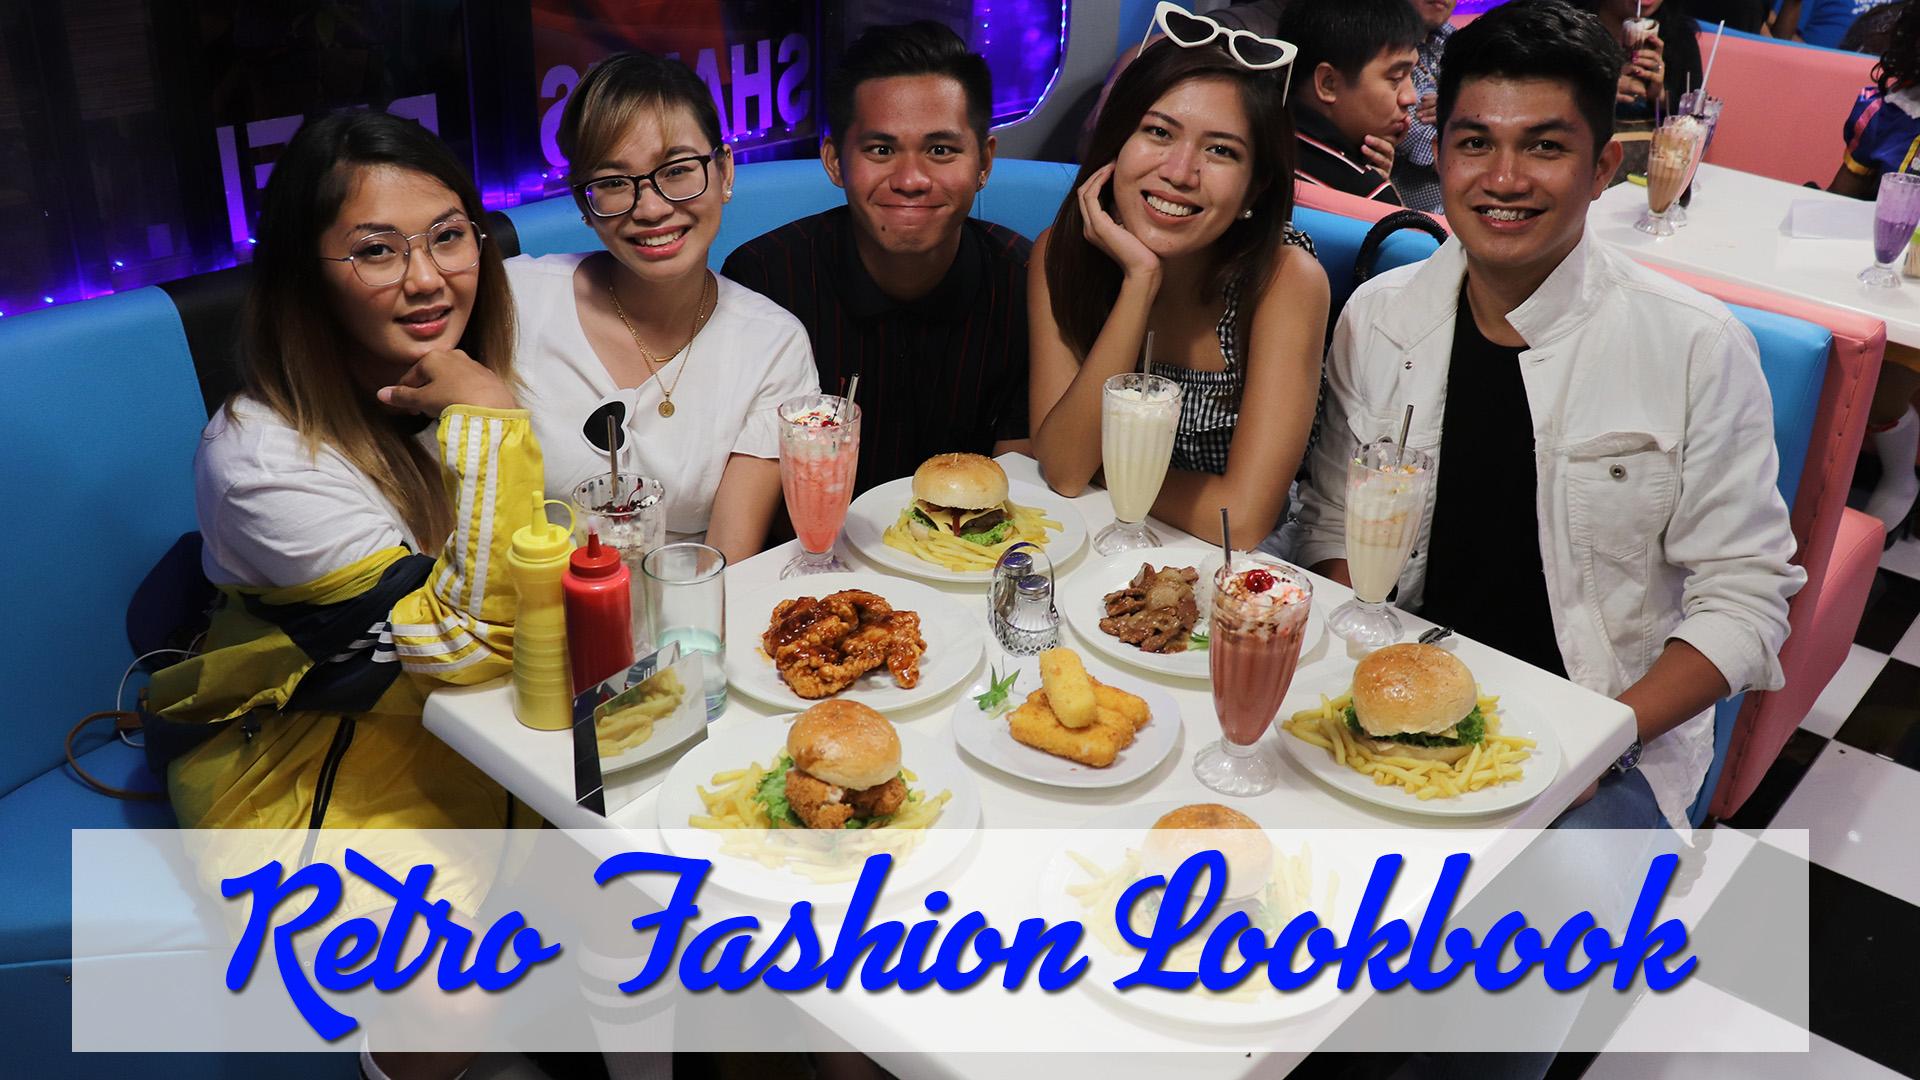 [VLOG] 1950's Retro Fashion Lookbook